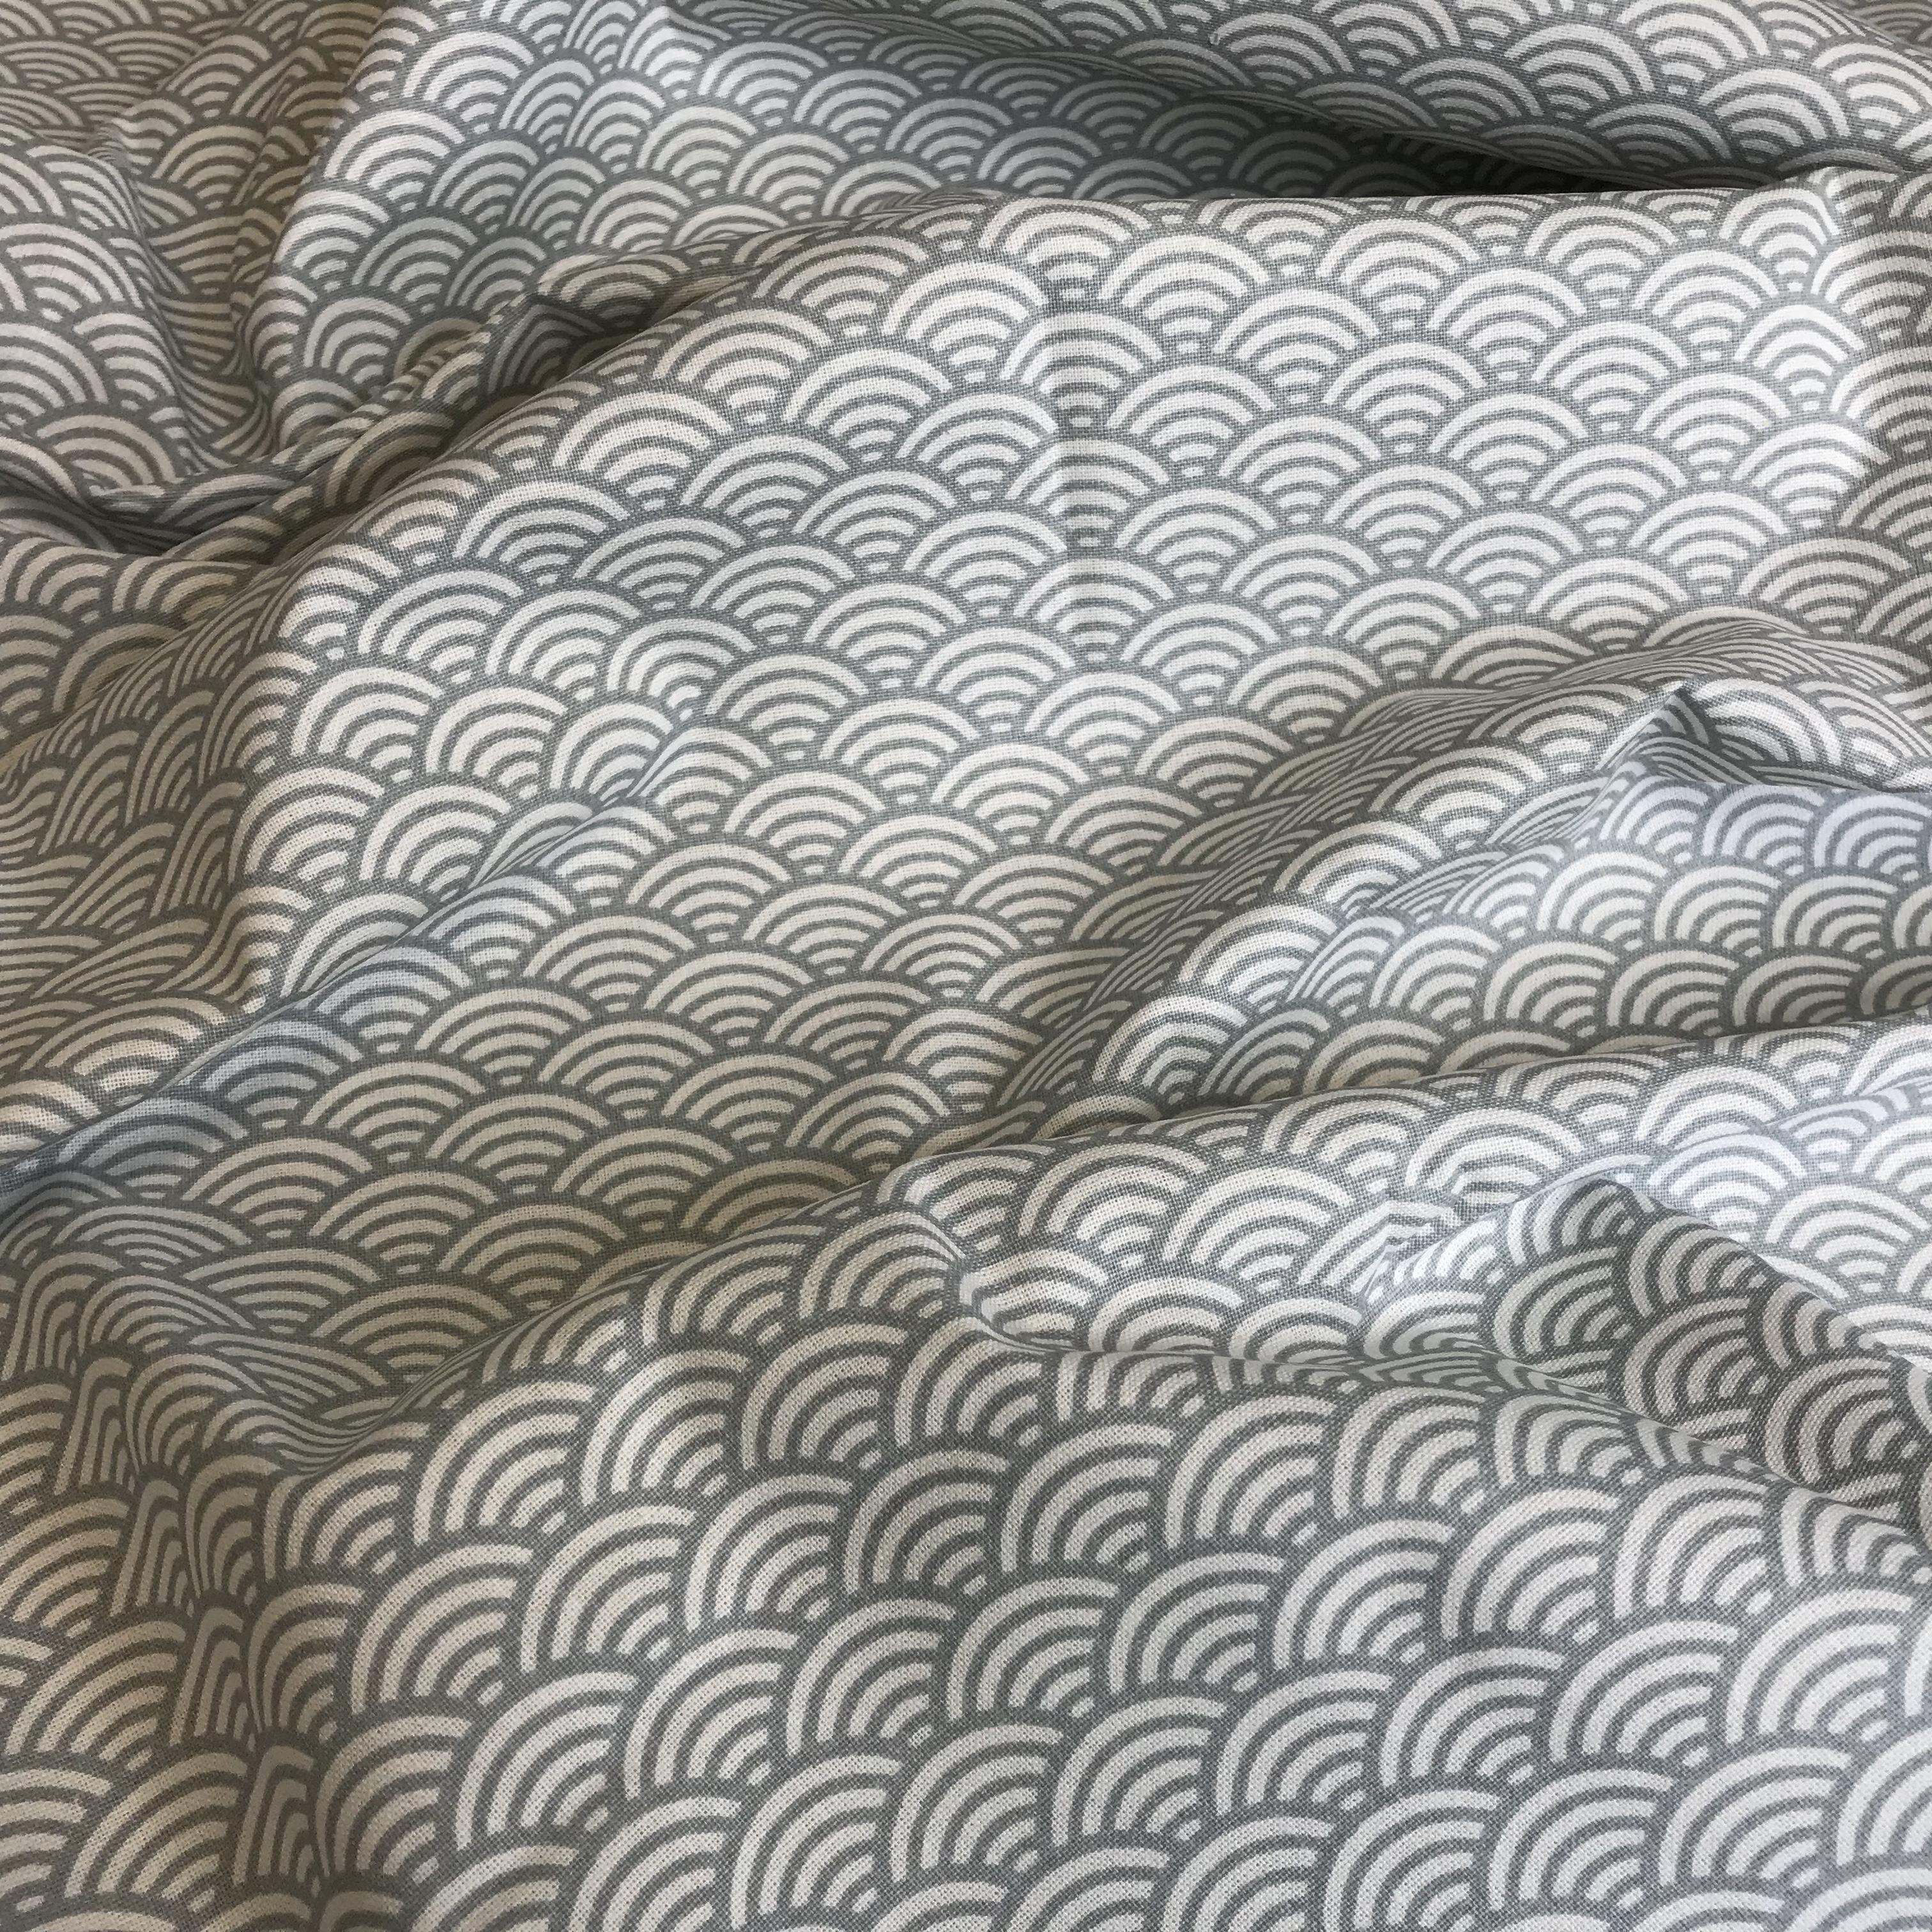 216_Sushis gris clair